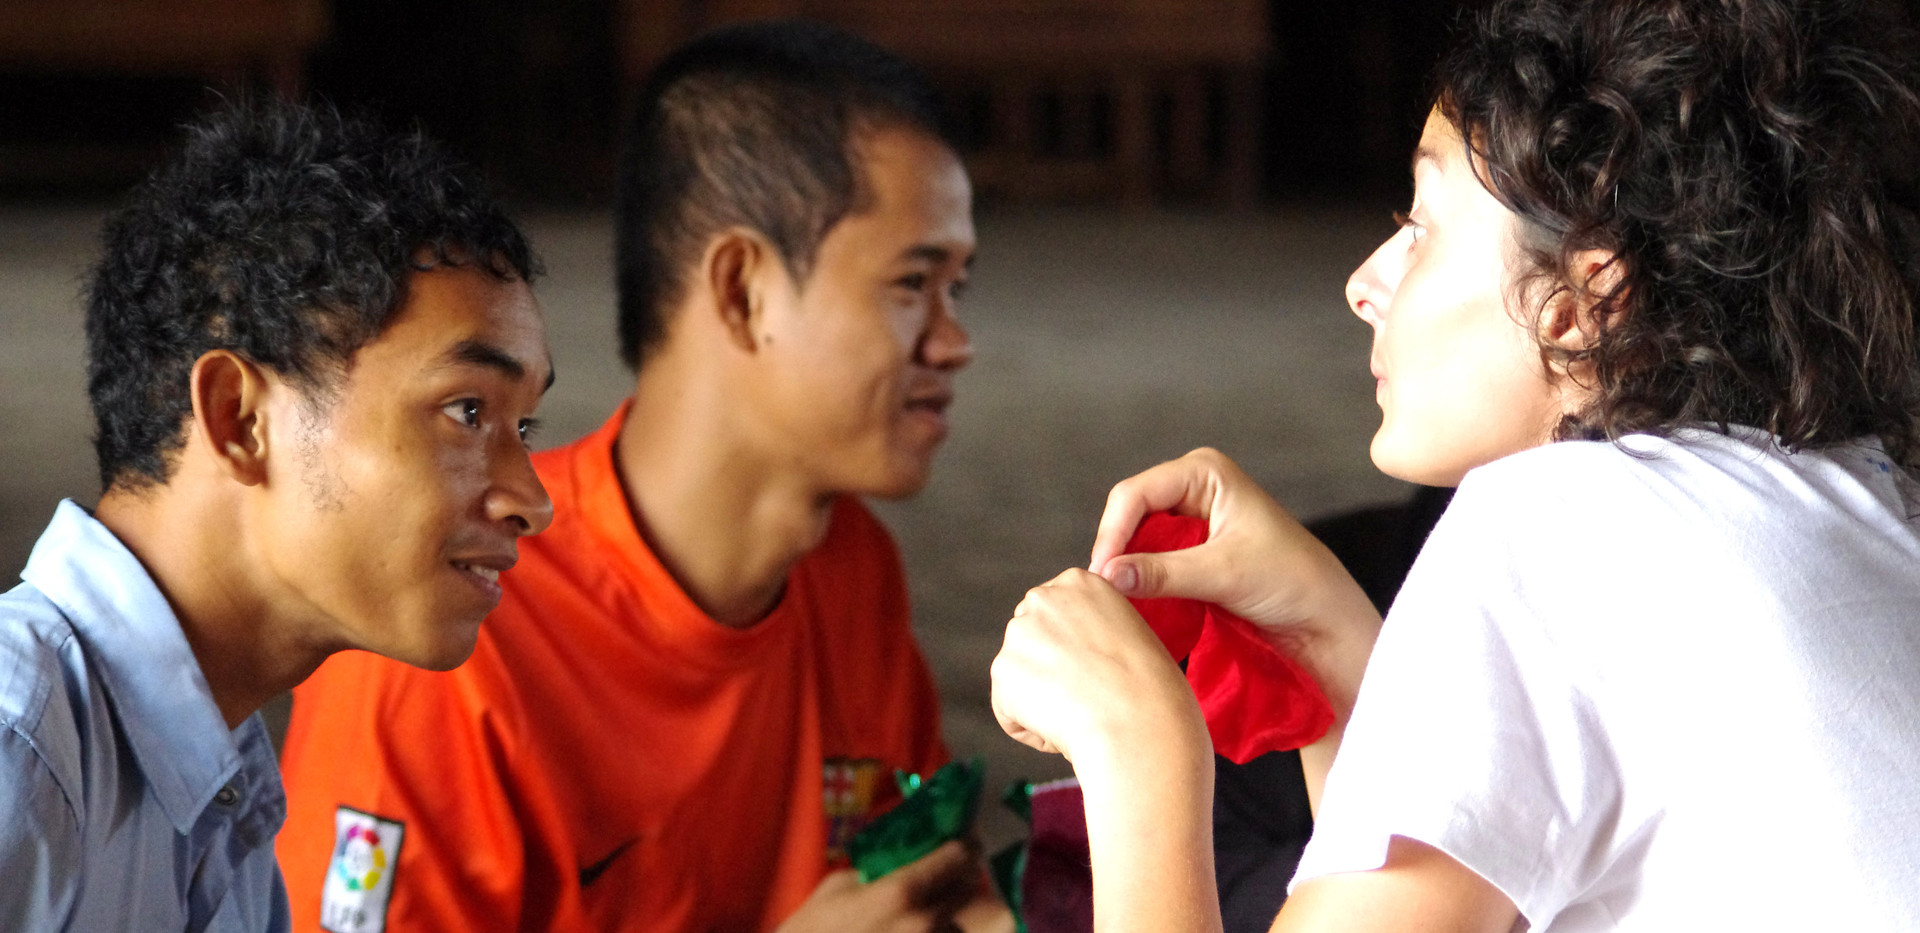 Cambodge2013_06.jpg